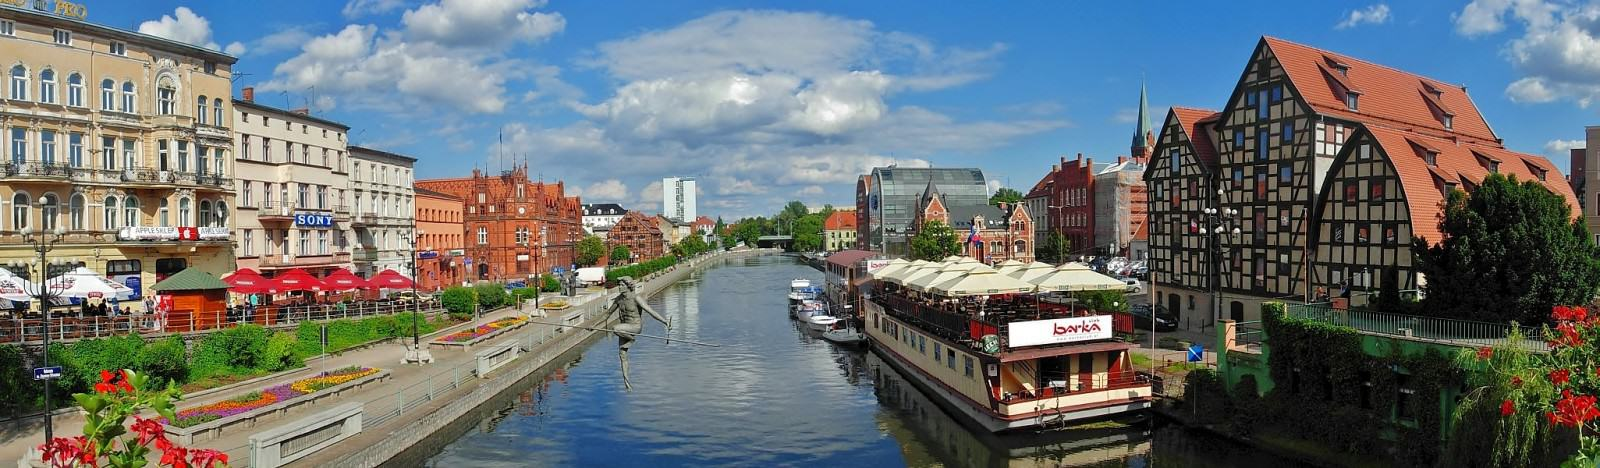 Bydgoszcz | fot. Pit1233 | lic. public domain